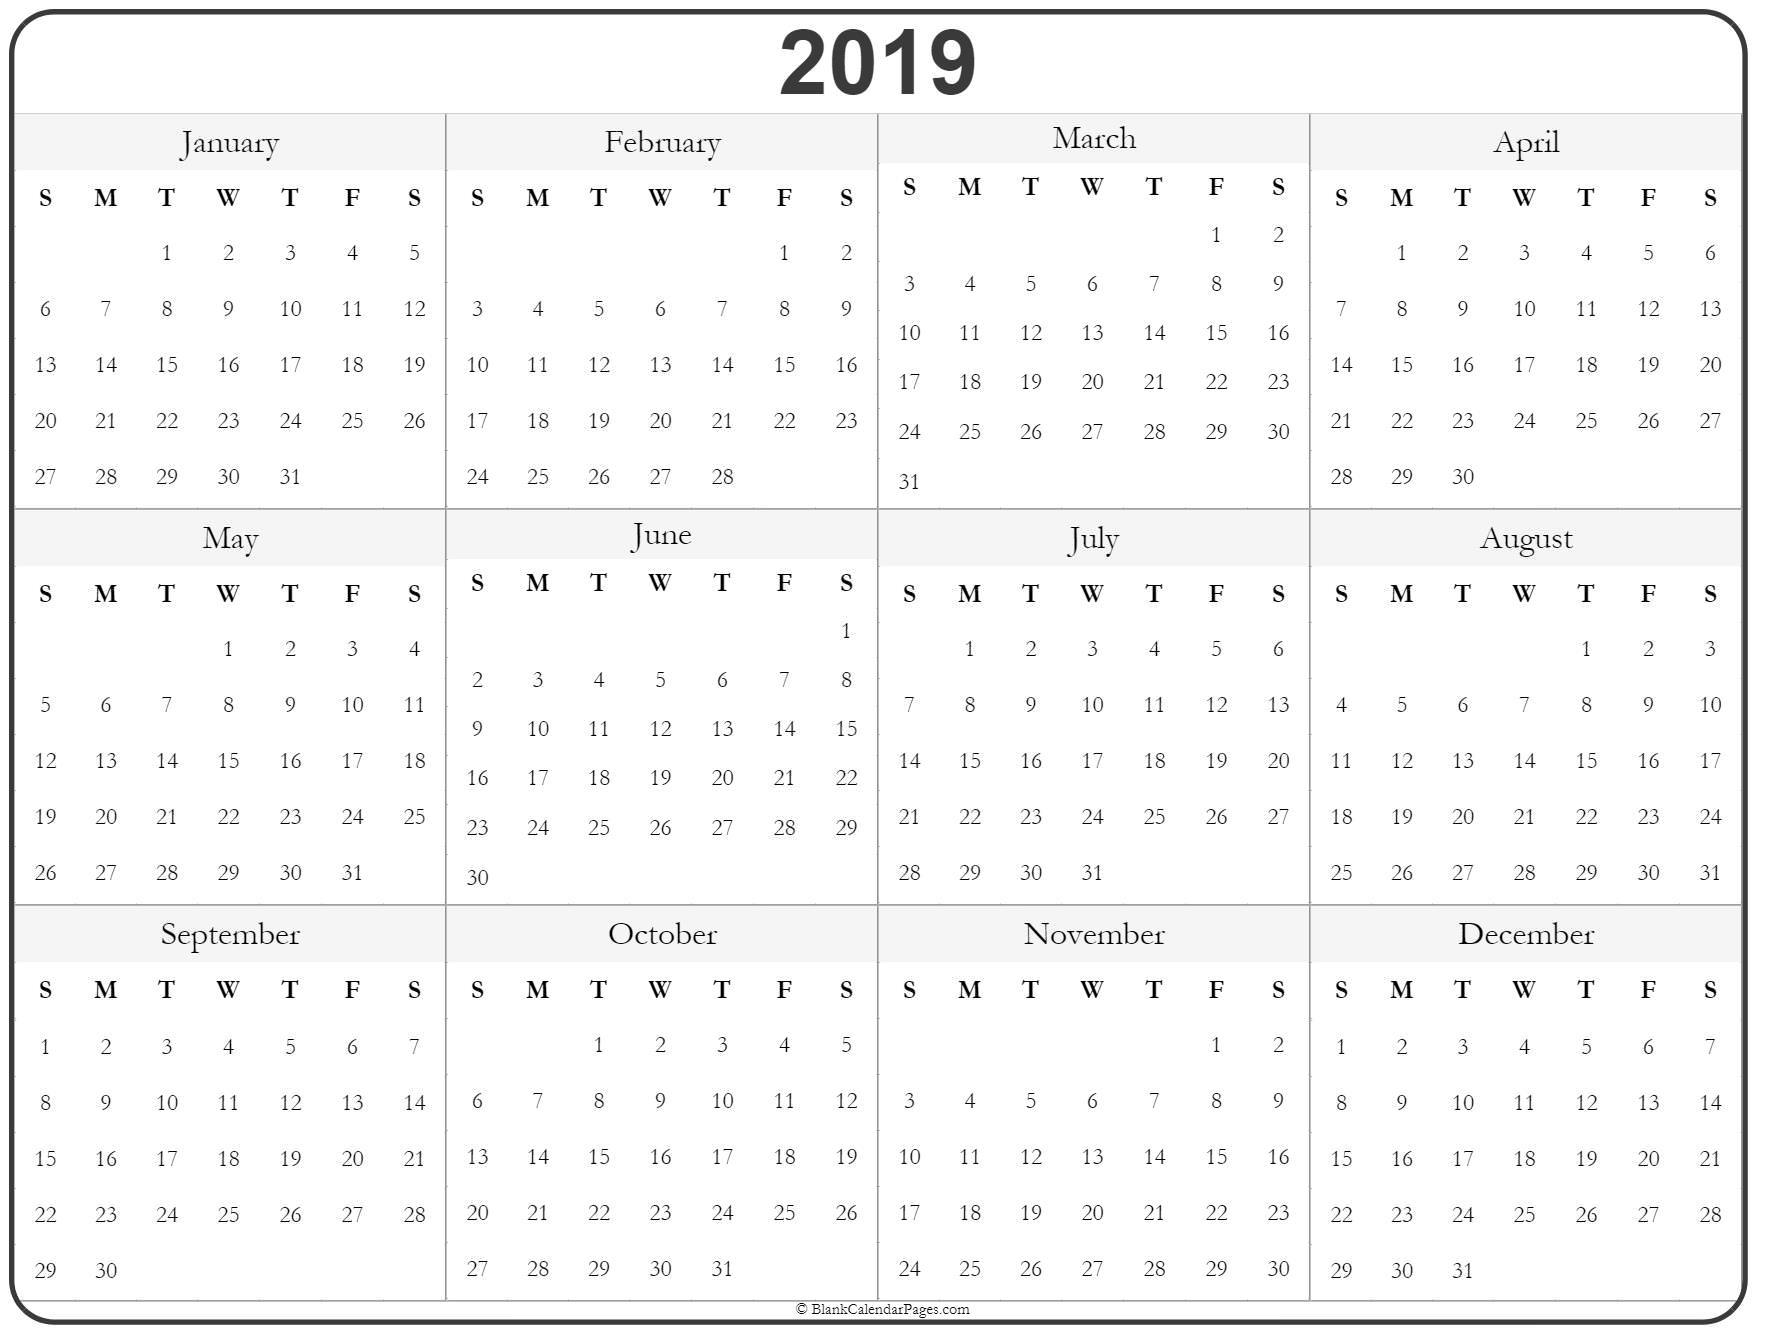 2019 Year Calendar | Yearly Printable